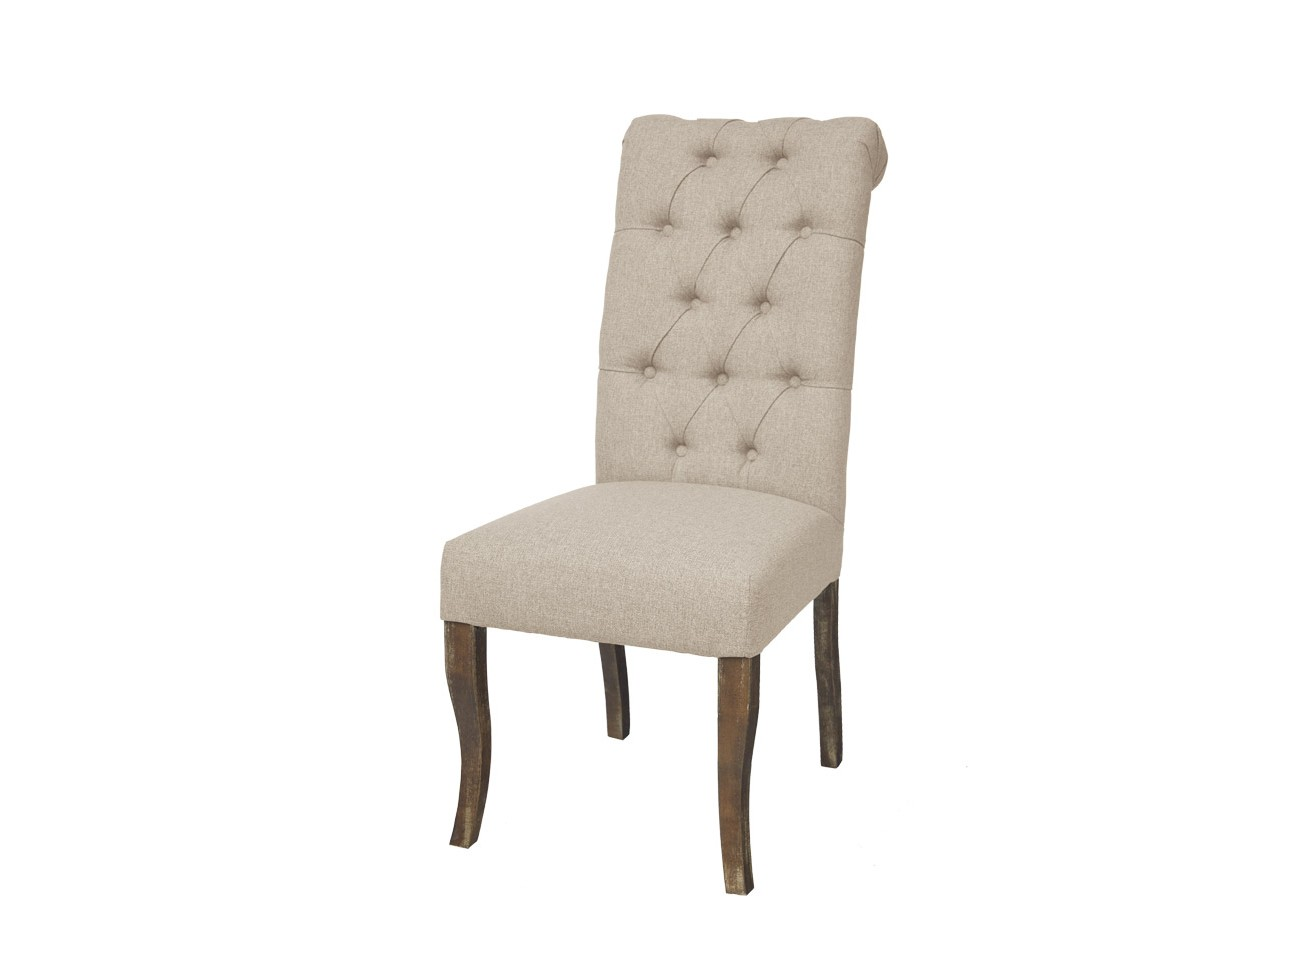 Кухонный стул Gramercy 9656827 от thefurnish